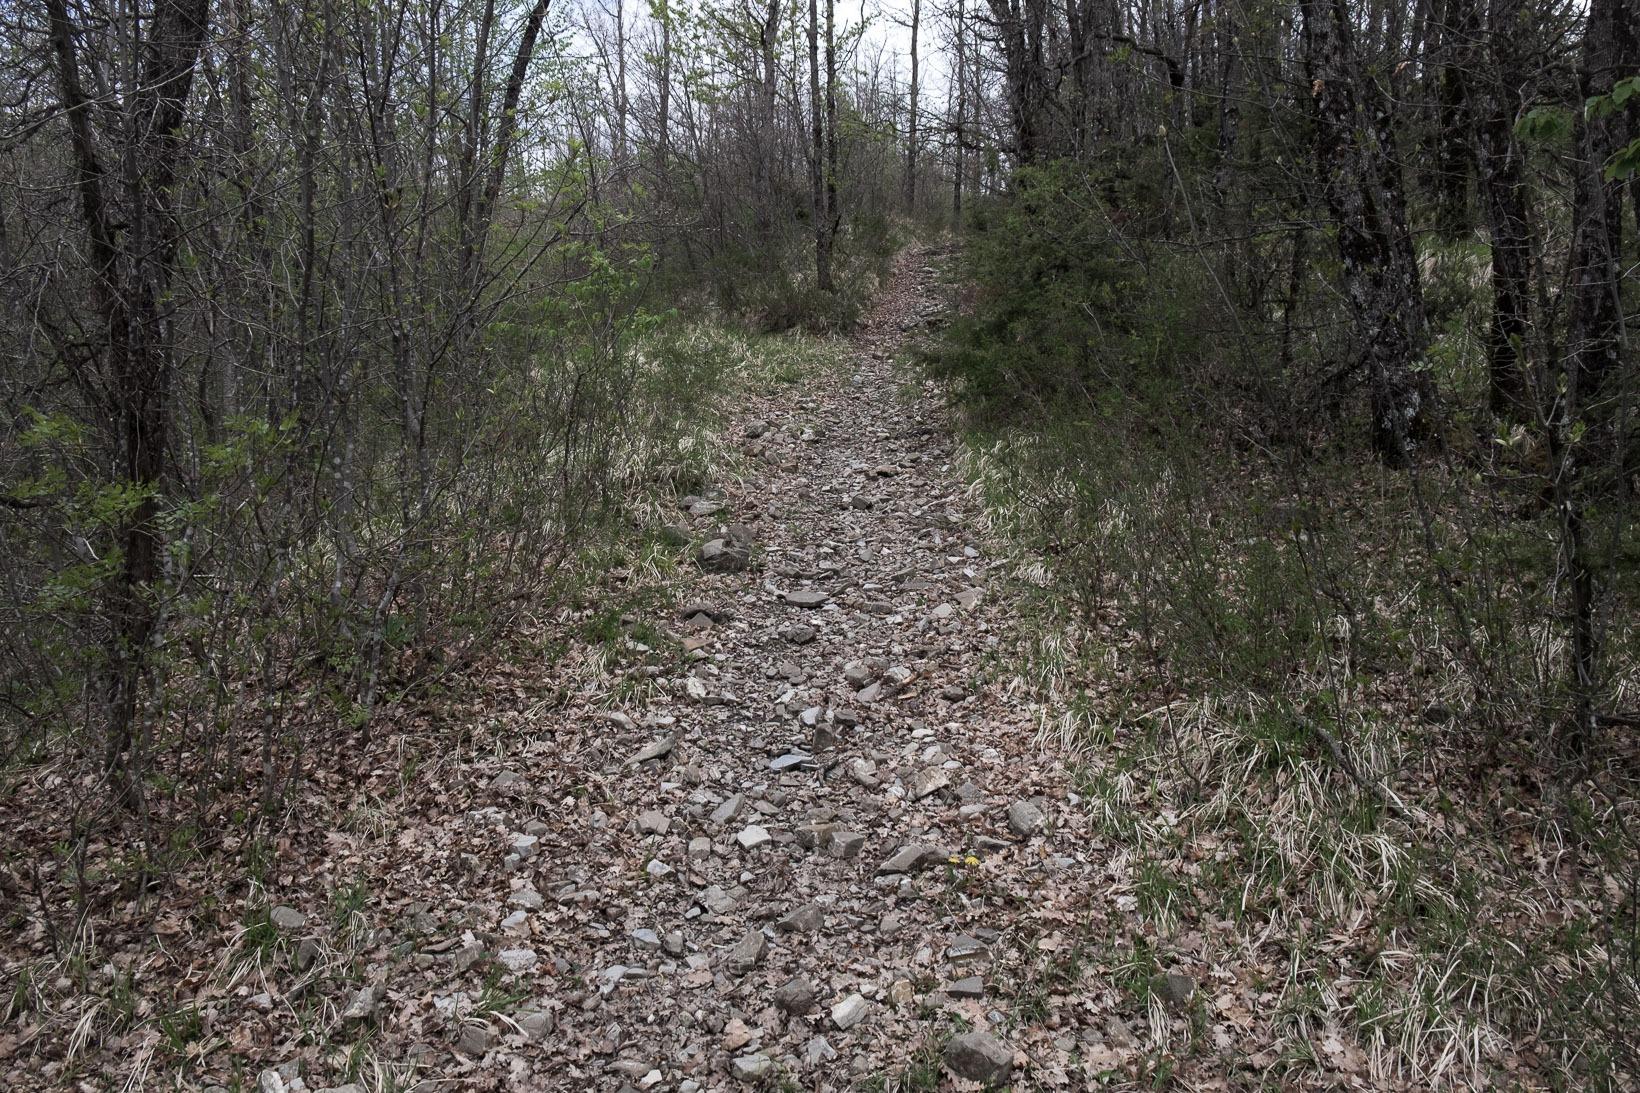 Monte-Belvedere-sentiero.